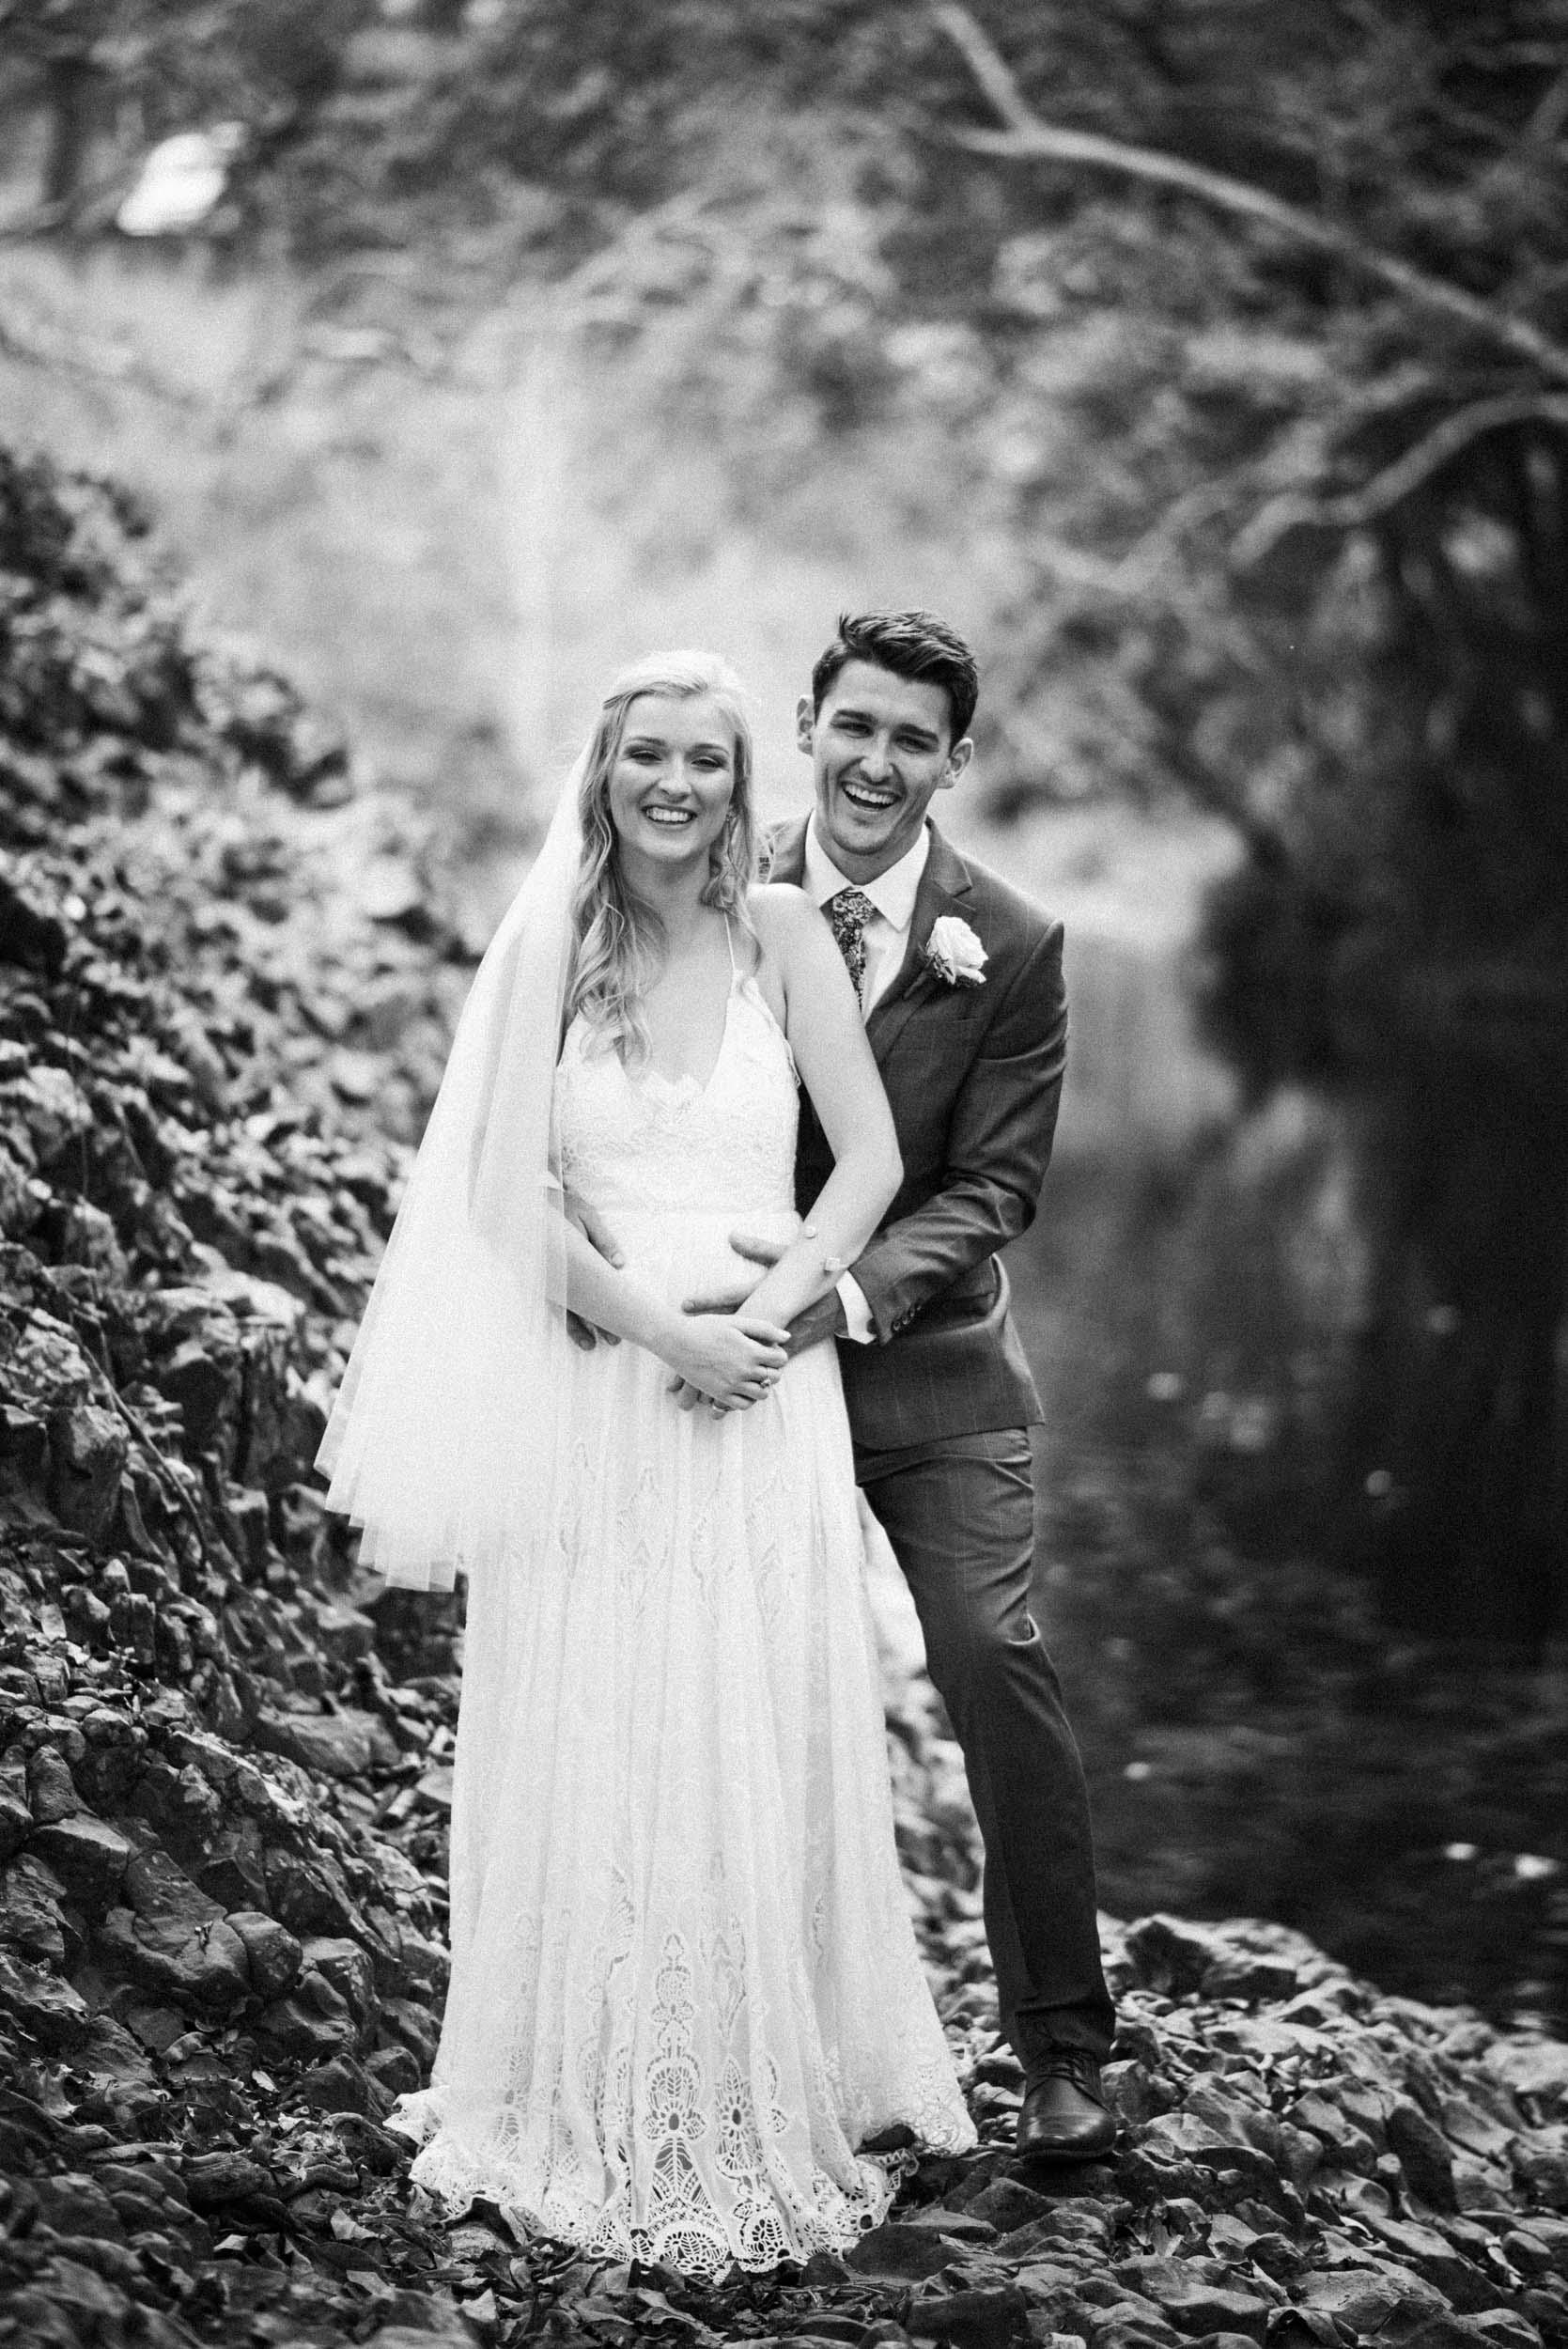 The Raw Photographer - Cairns Wedding Photographer - Laloli - Cairns Garden Wedding - Wedding Dress-53.jpg